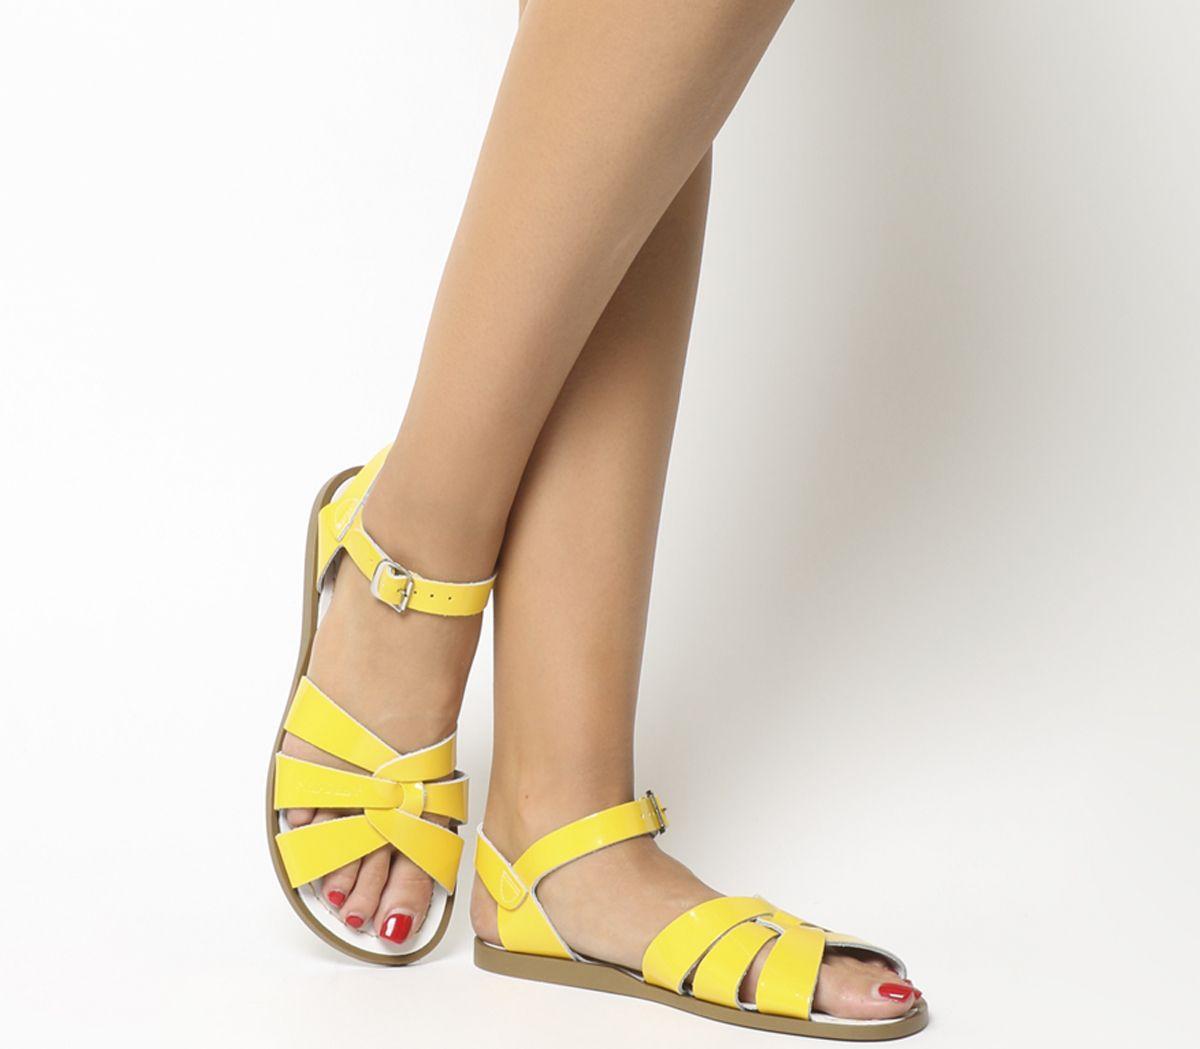 b233c8d1bf6 Salt Water Original Sandals Yellow Patent - Sandals